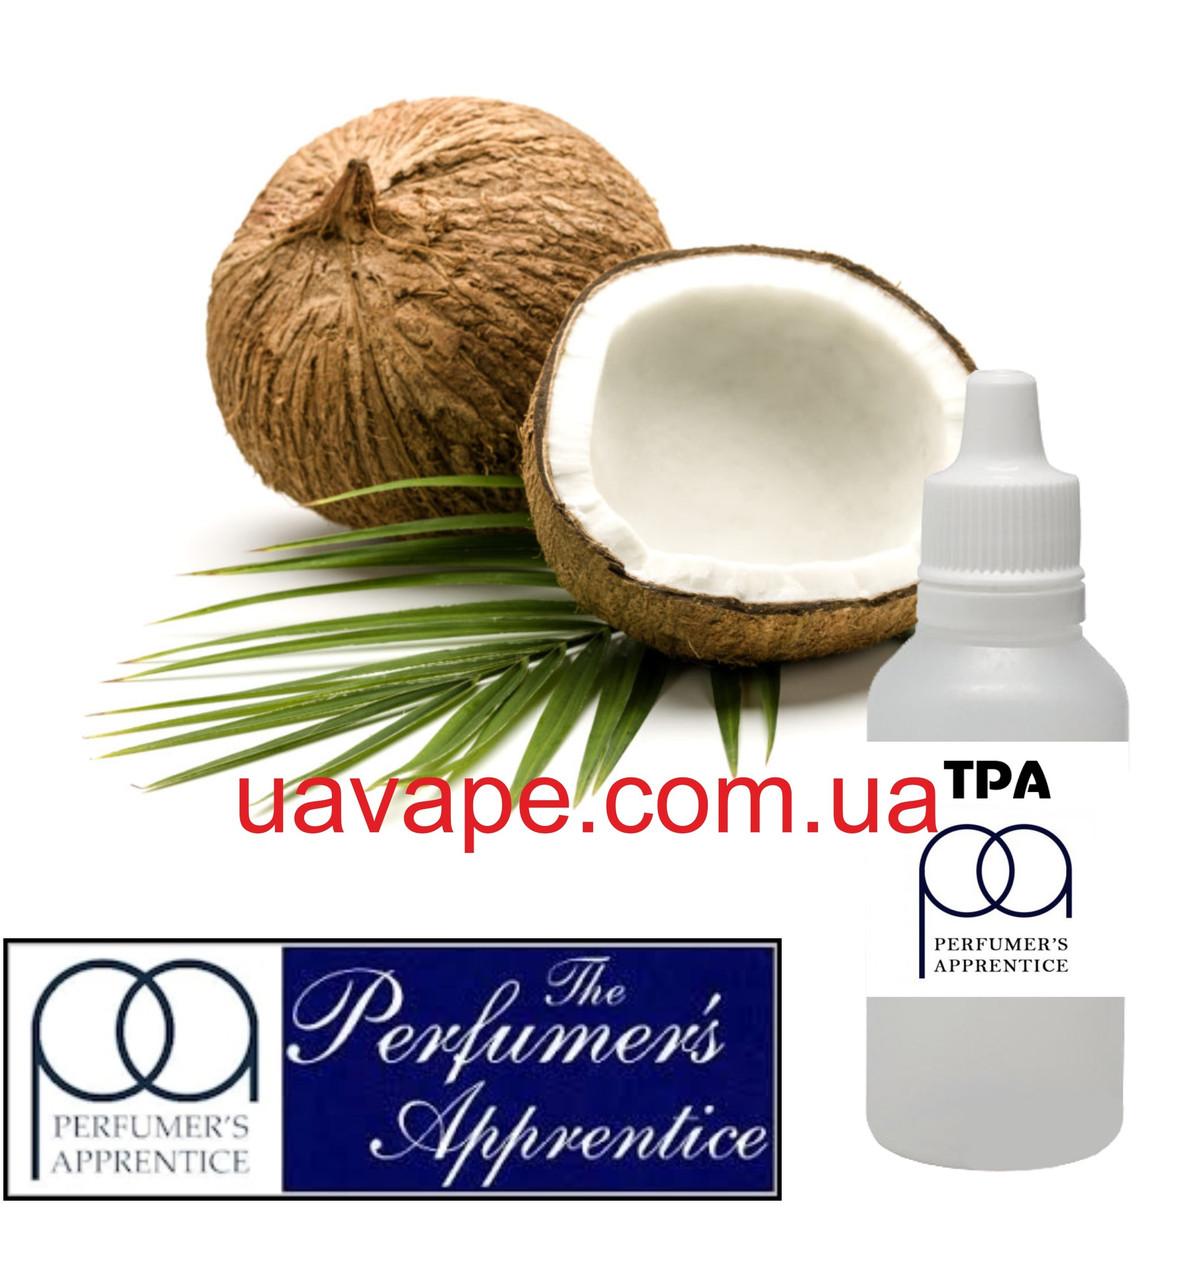 Ароматизатор Coconut Flavor ТПА Кокос ароматизатор, 10 мл